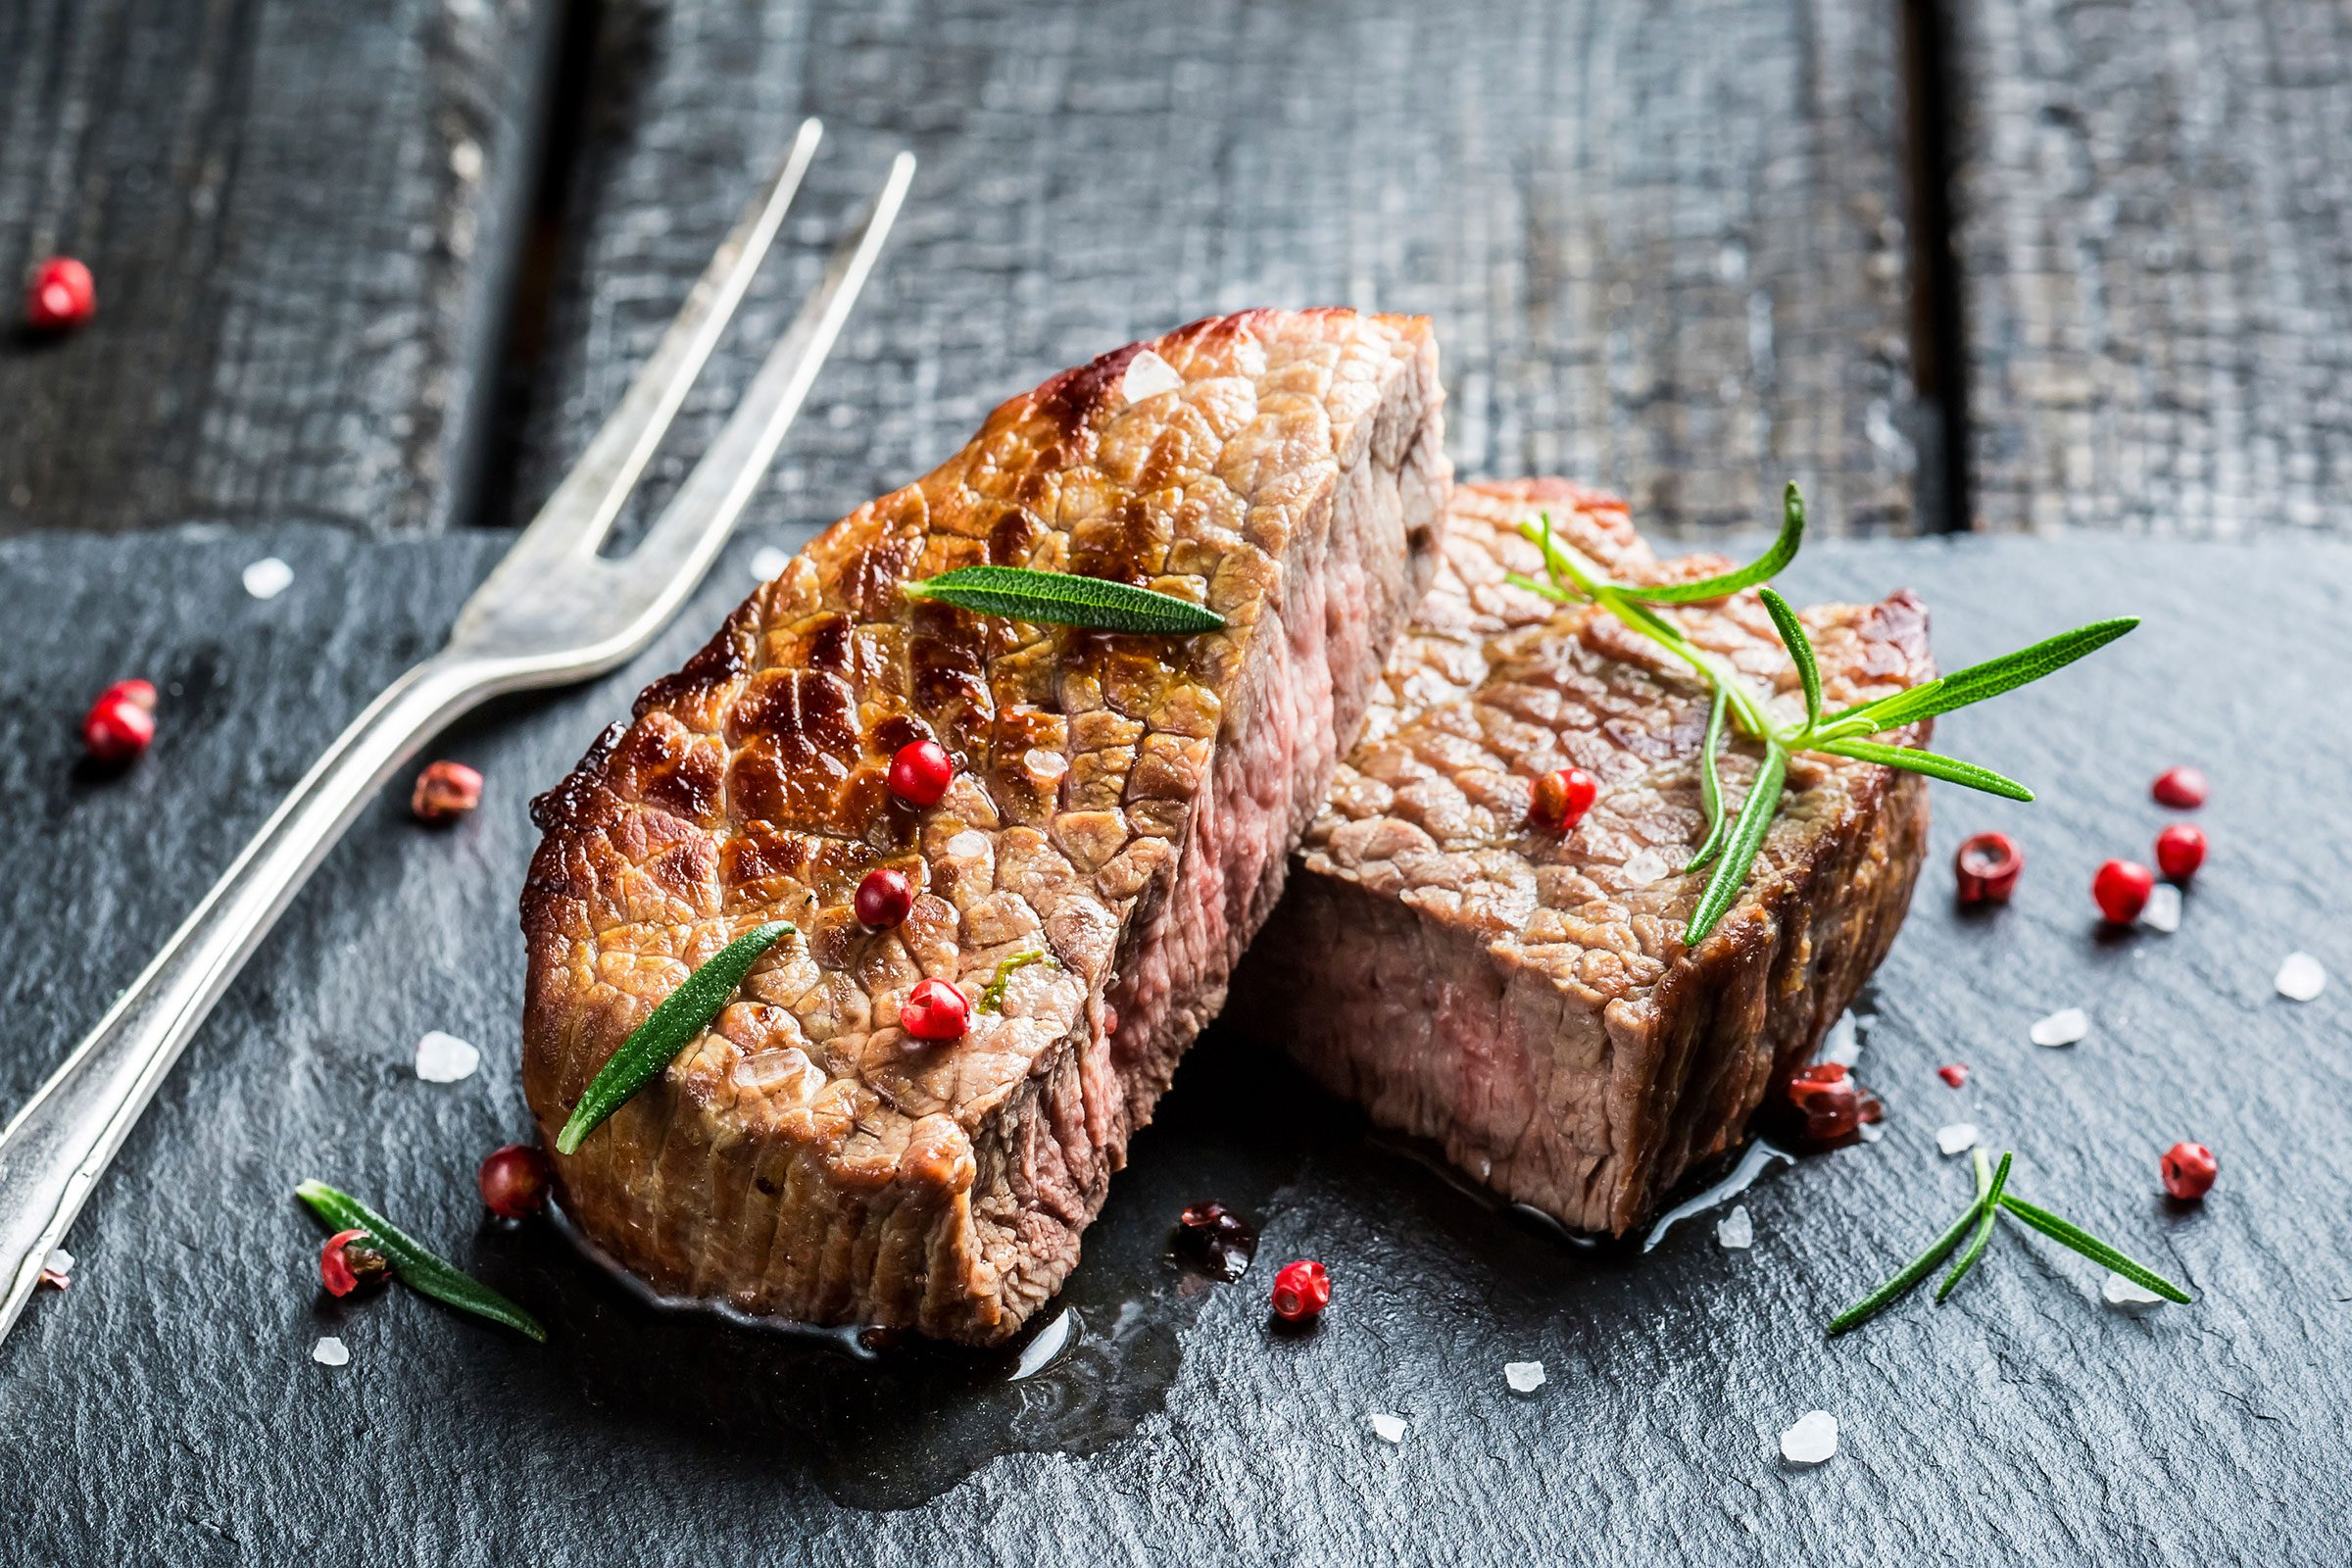 15. Sirloin steak or rib-eye?